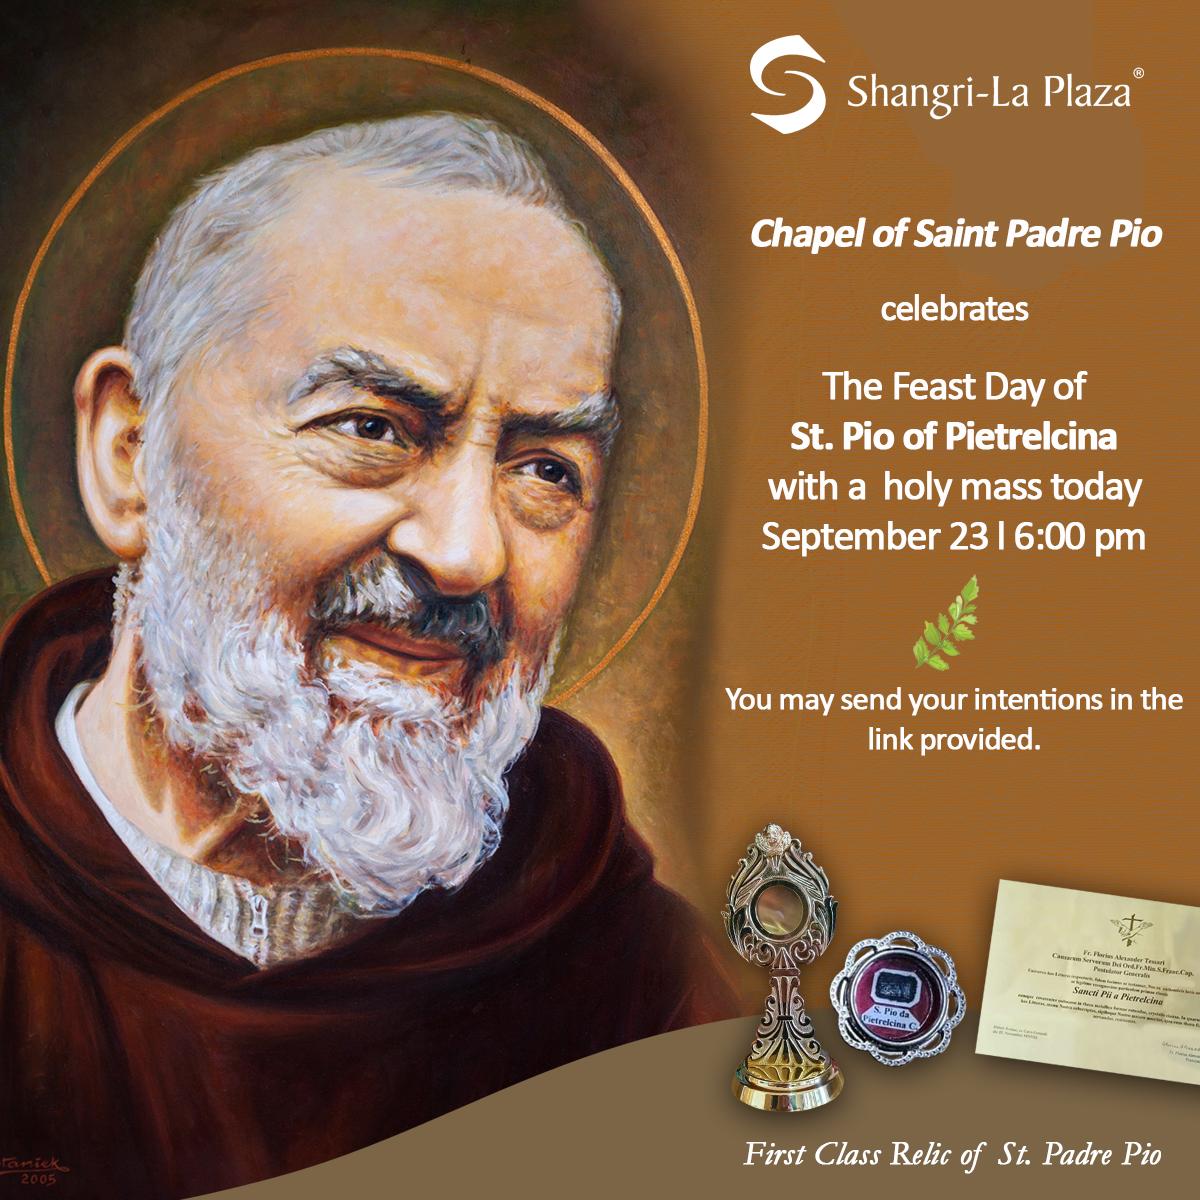 Feast Day of Saint Padre Pio